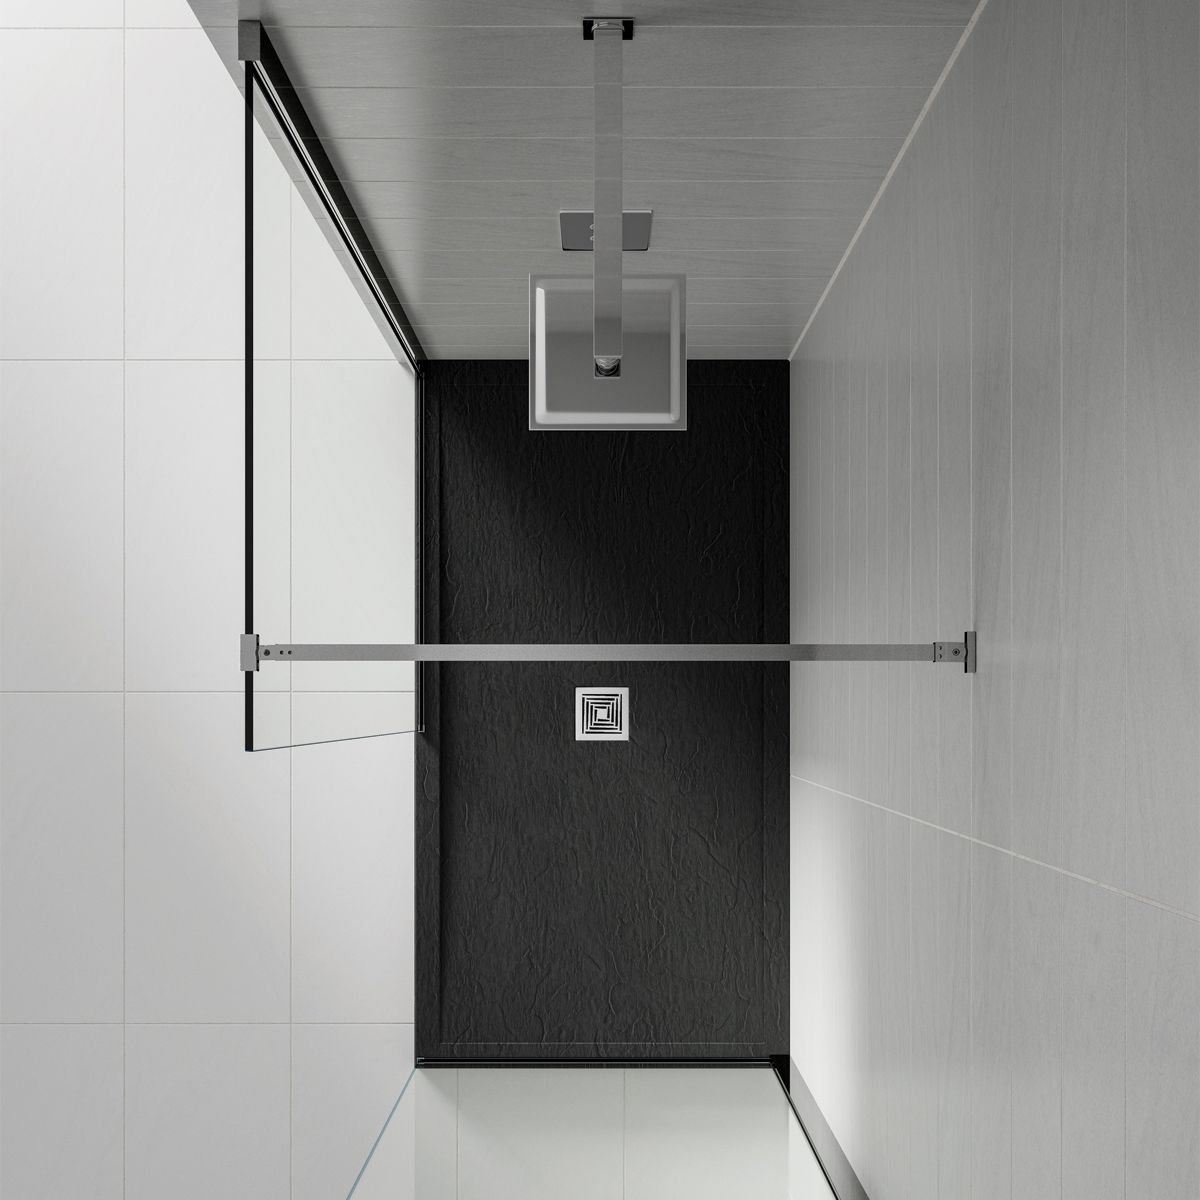 Aquadart Black Slate Shower Tray 1500 x 800 Overhead